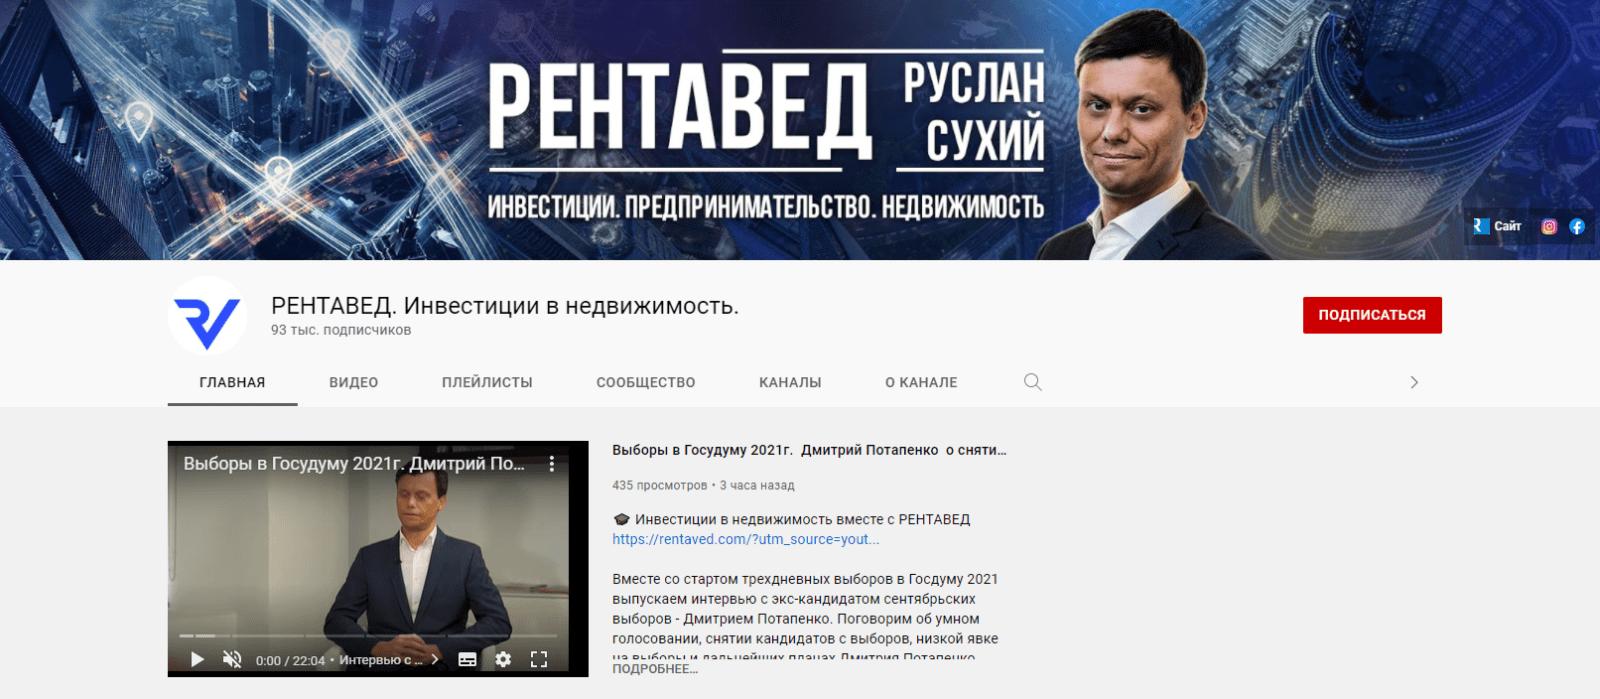 Ютуб-канал Рентавед